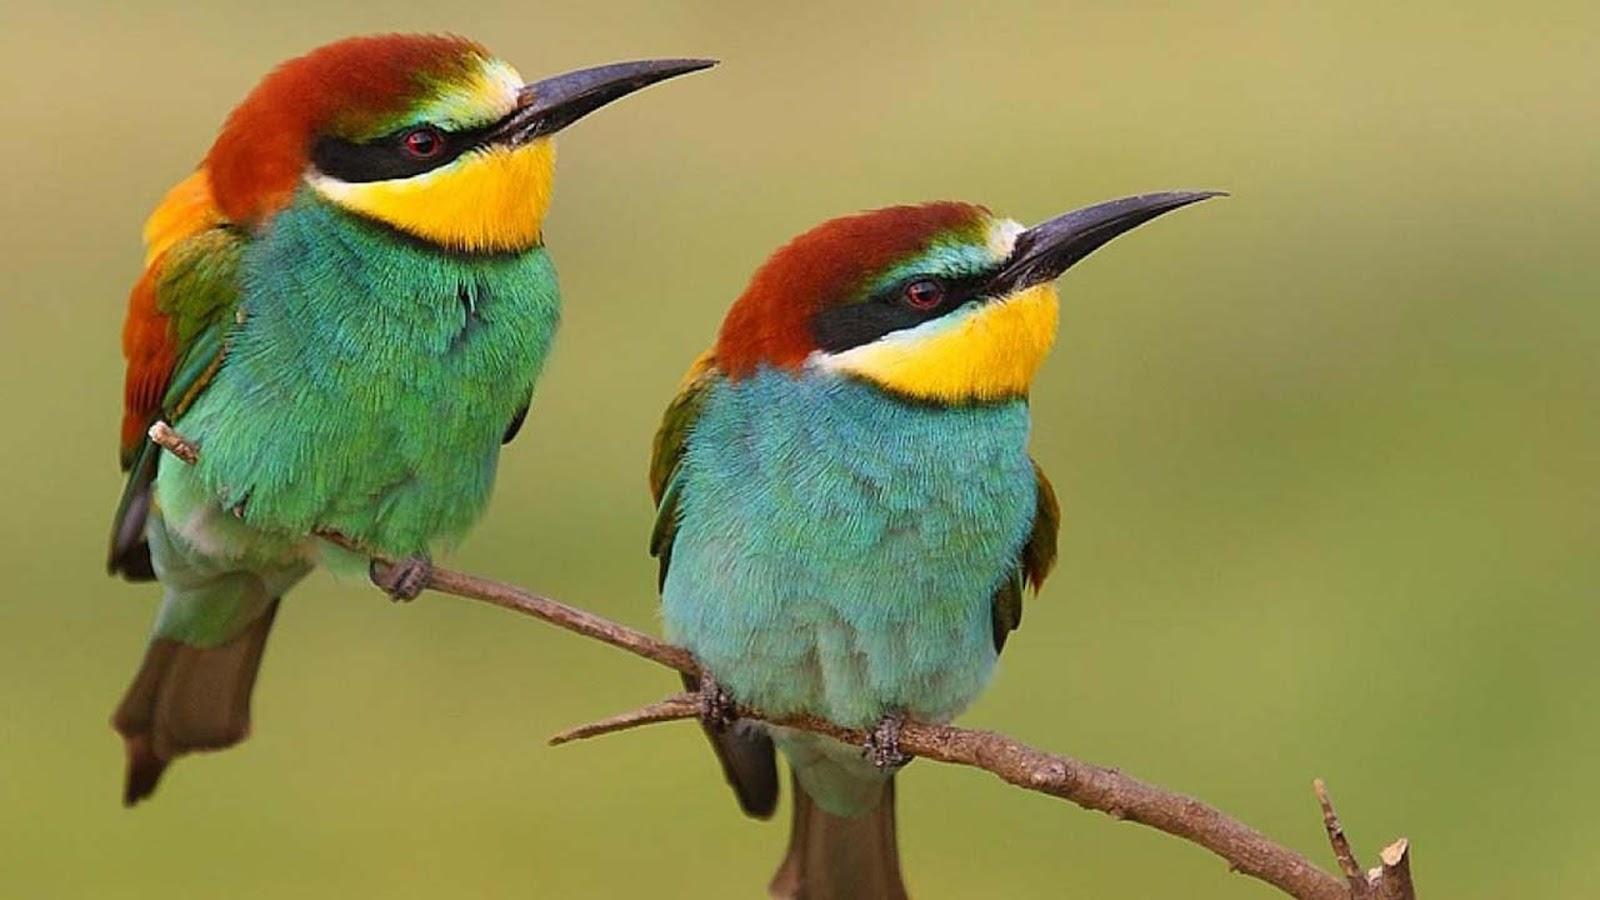 بالصور صور عصافير , اجمل صور عصافير ملونه 5696 1